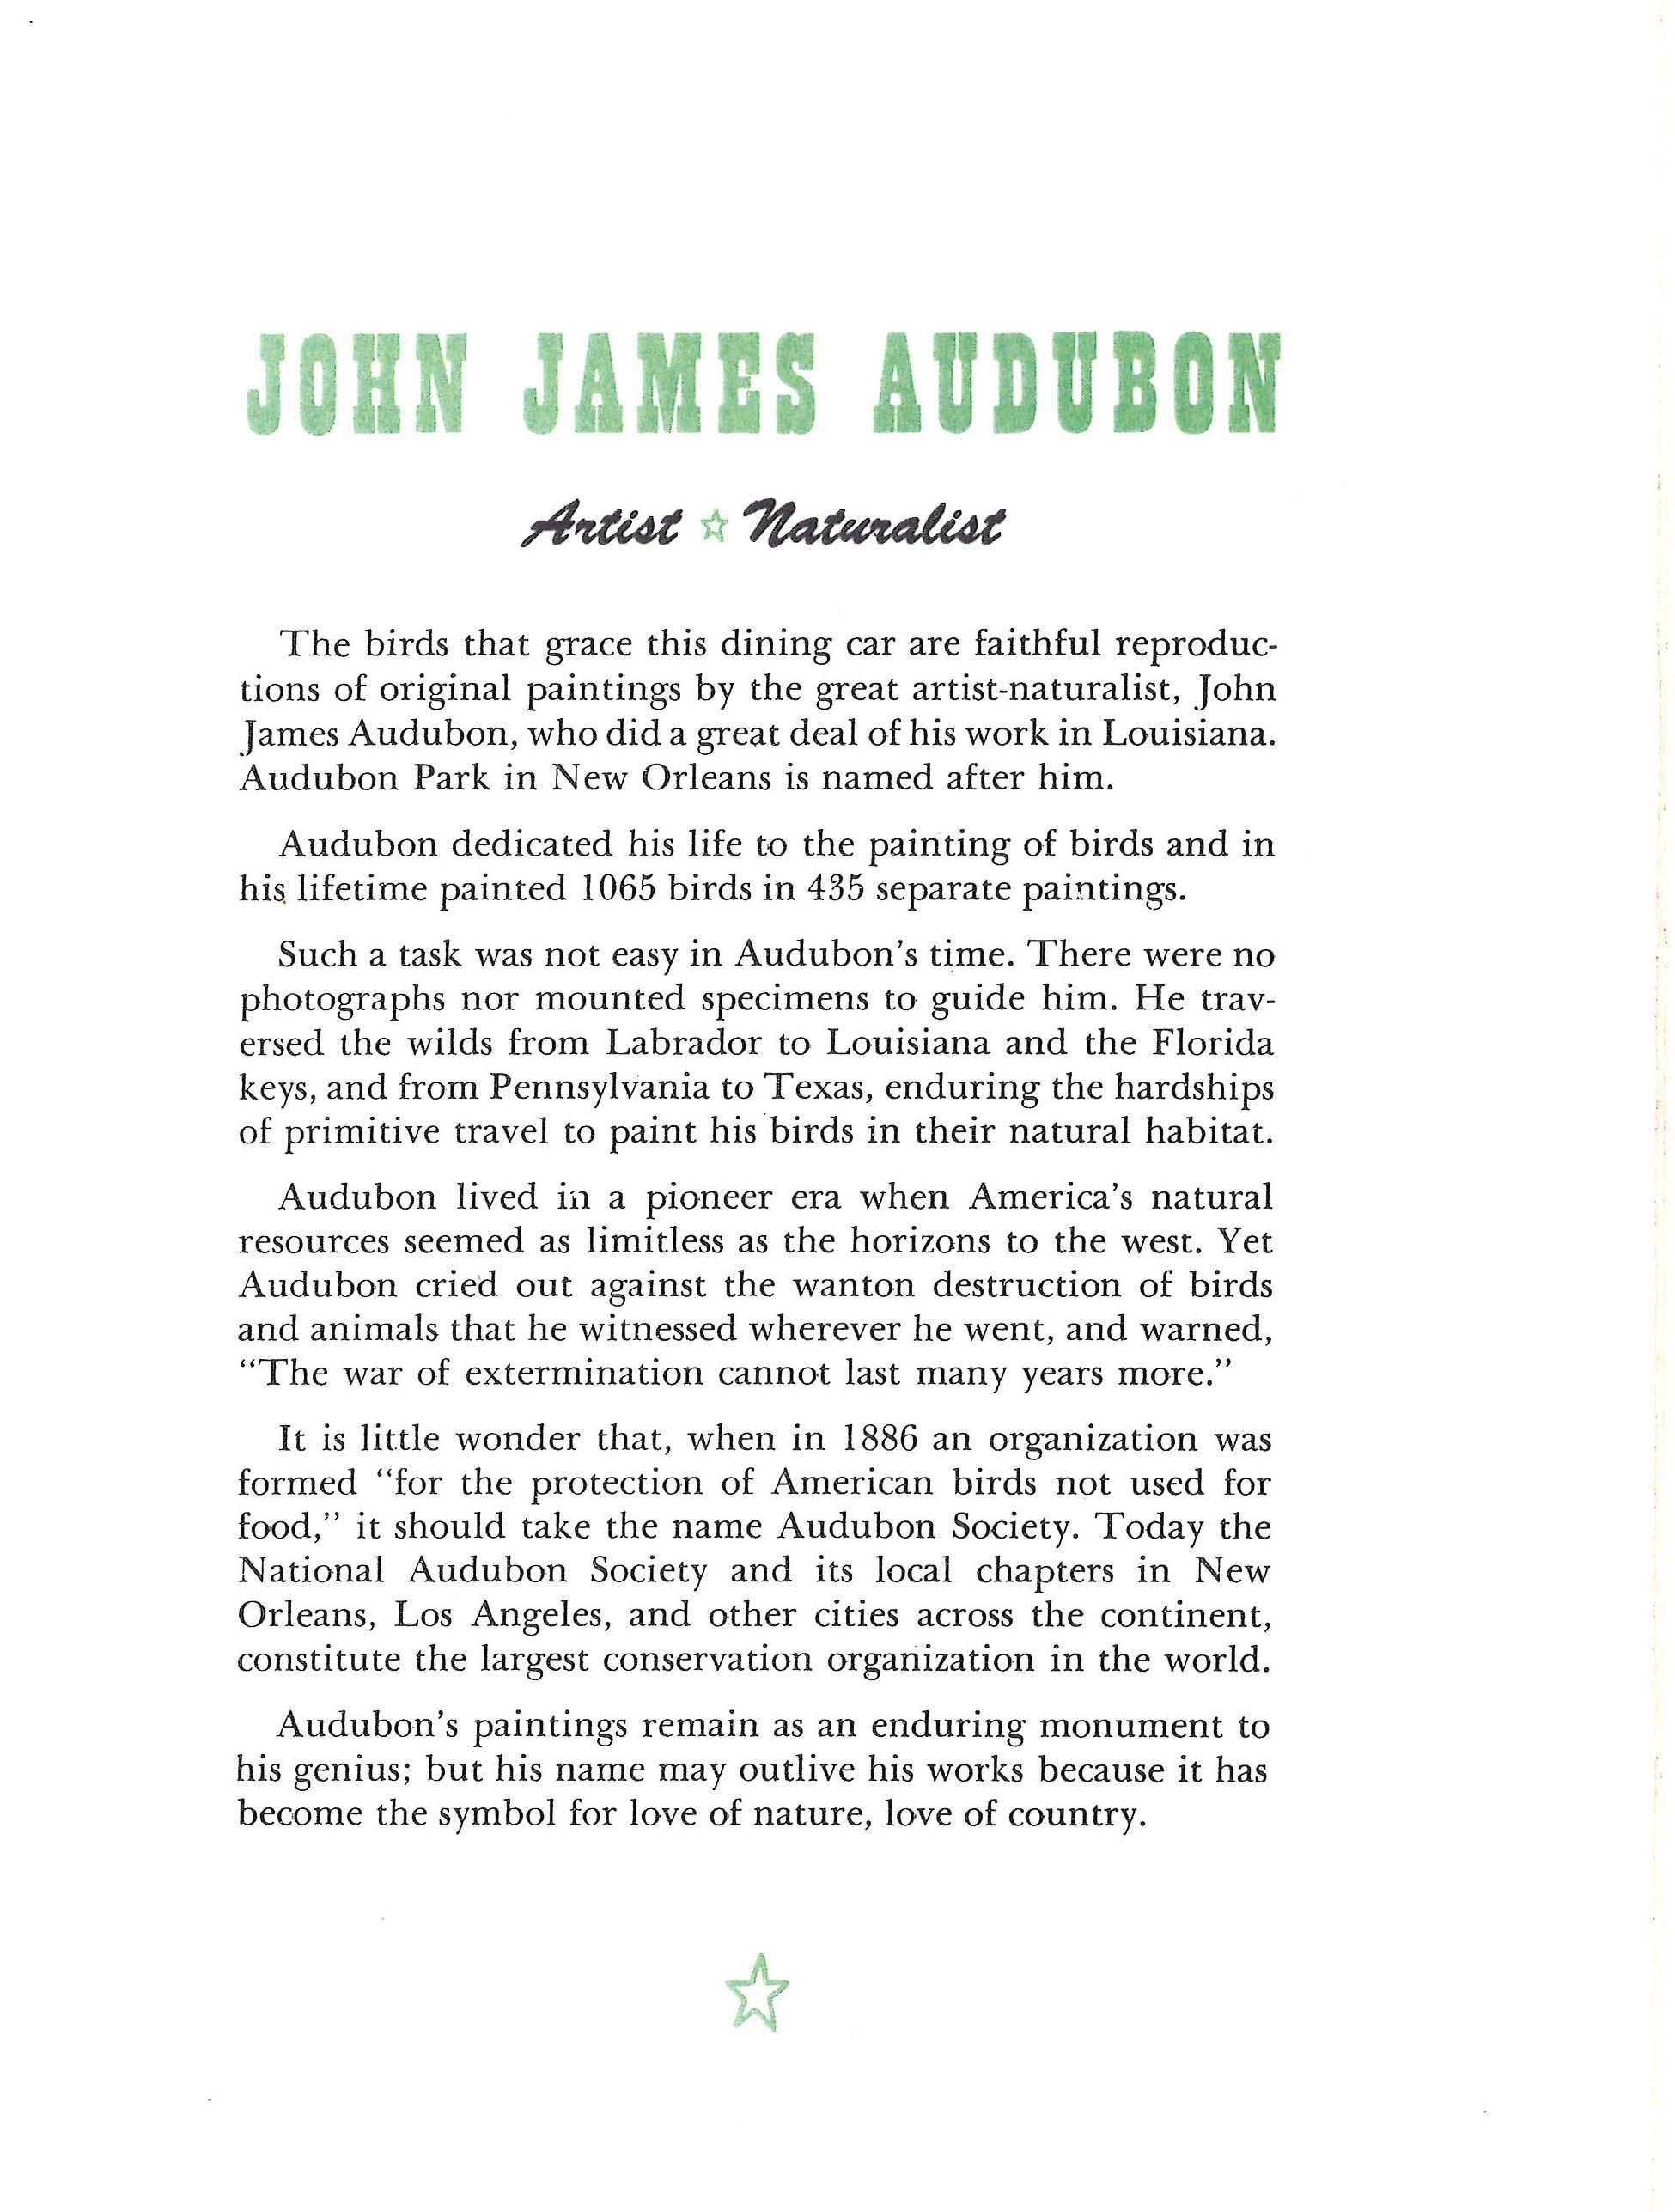 SP+John+James+Audubon+Breakfast+Menu+3-64 3.jpg